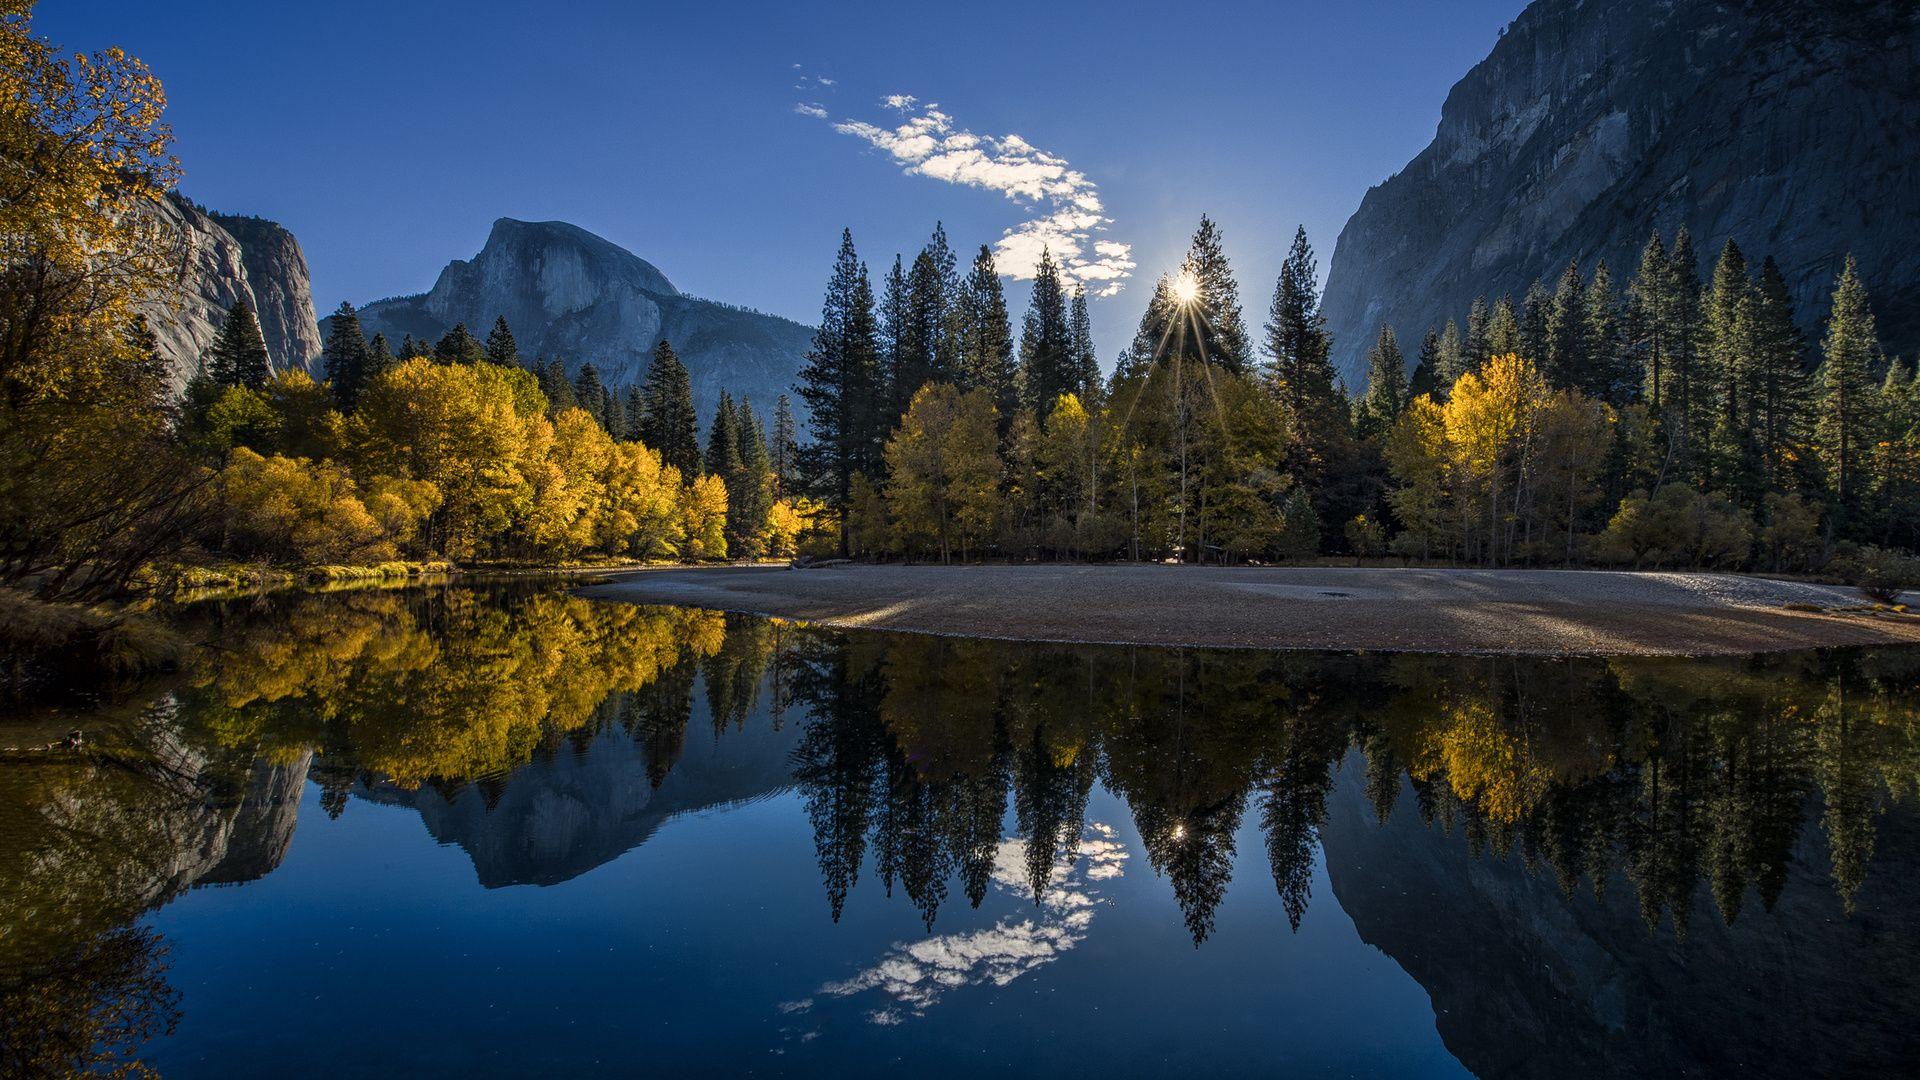 Yosemite Park California Landscape Wallpaper - http://www.gbwallpapers.com/yosemite-park-california-landscape-wallpaper/ ( / Nature)